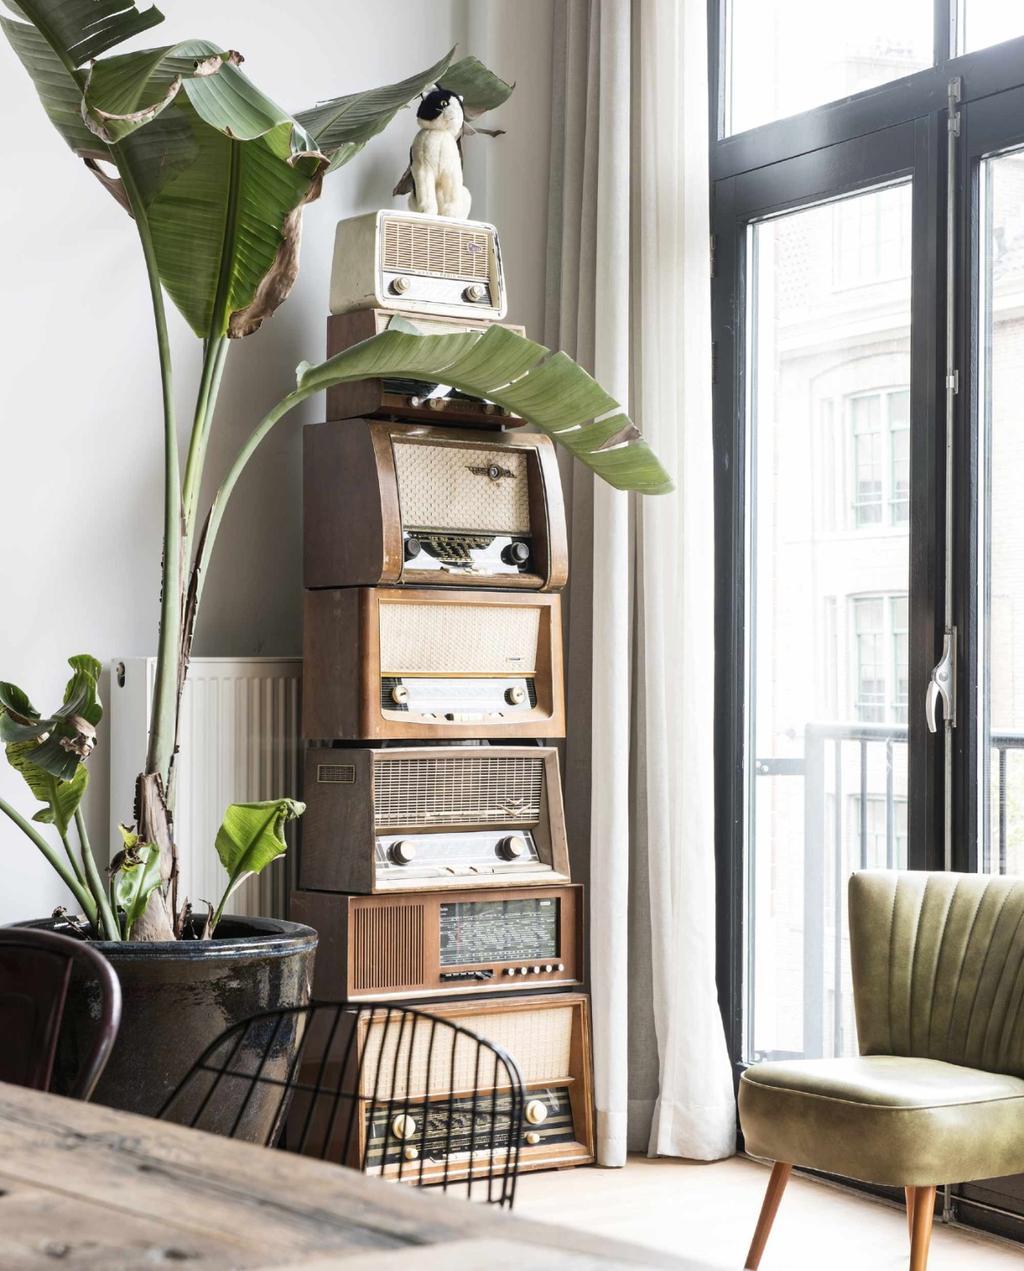 Plantenasiels in Nederland   grote kamerplant   strelizia   vintage   oude radio   fauteuil